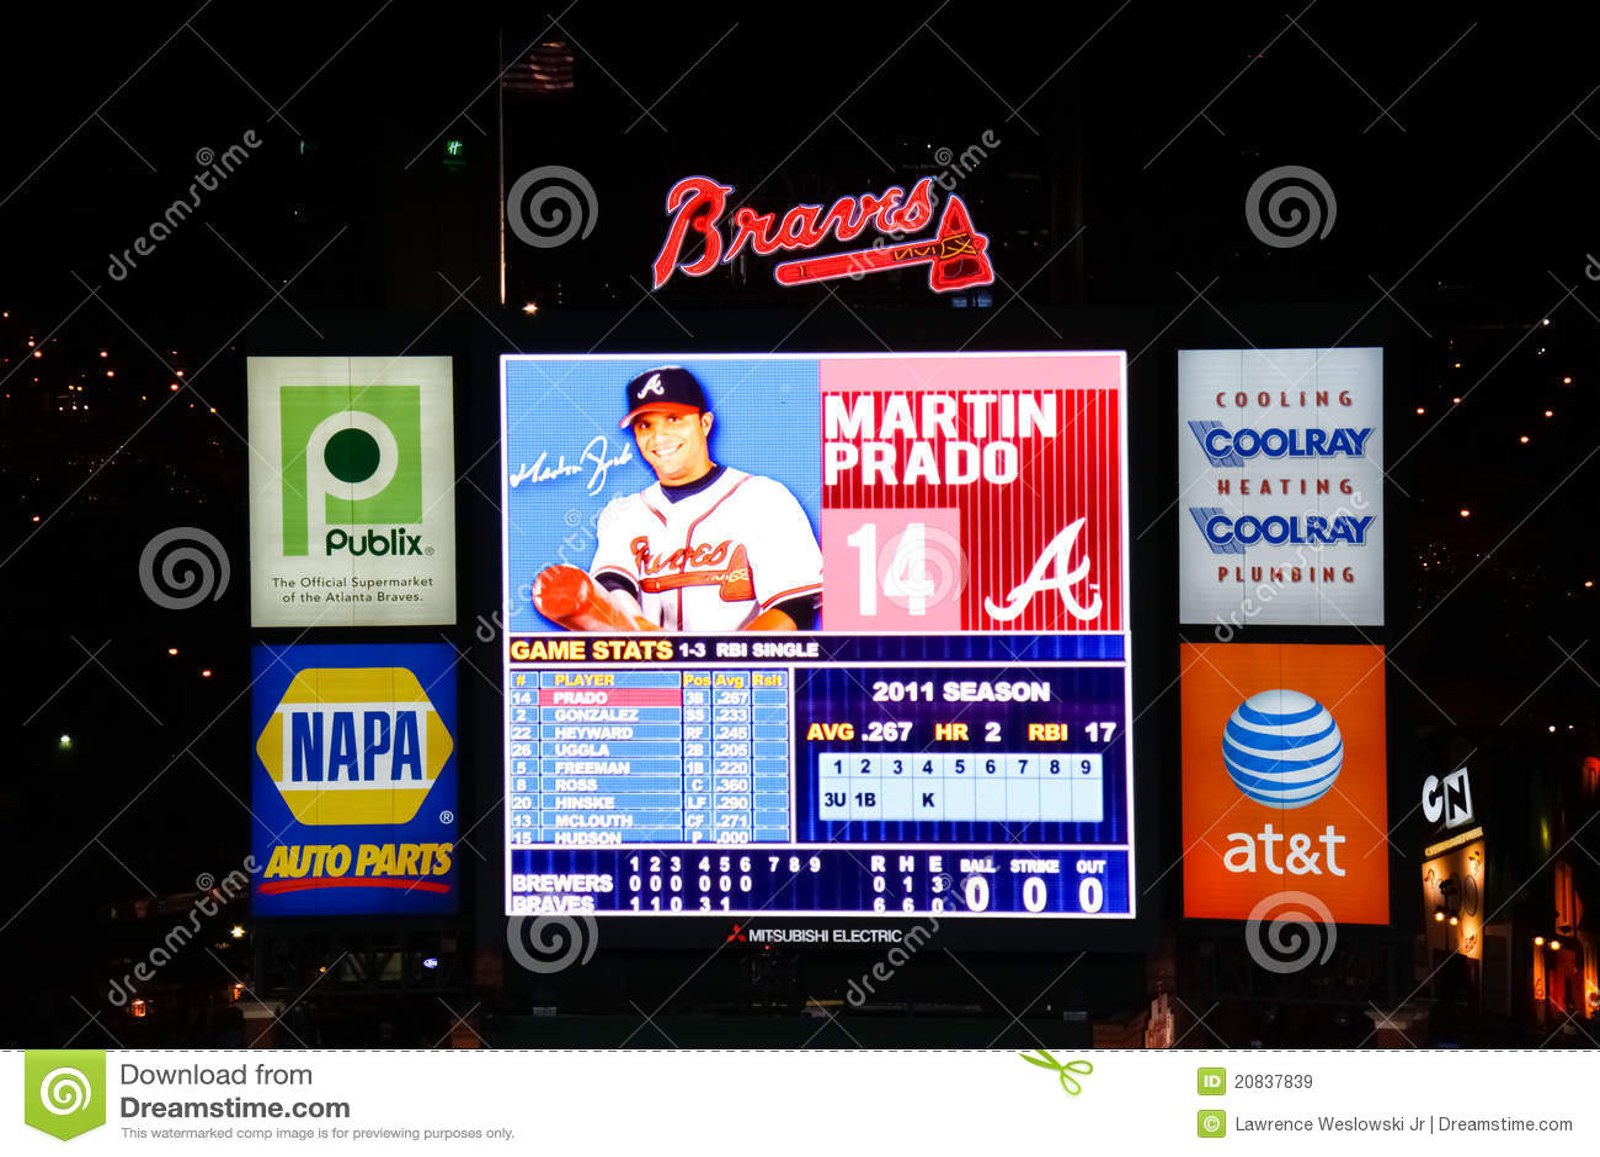 Baseball Atlanta Braves Turner Field Scoreboard Editorial